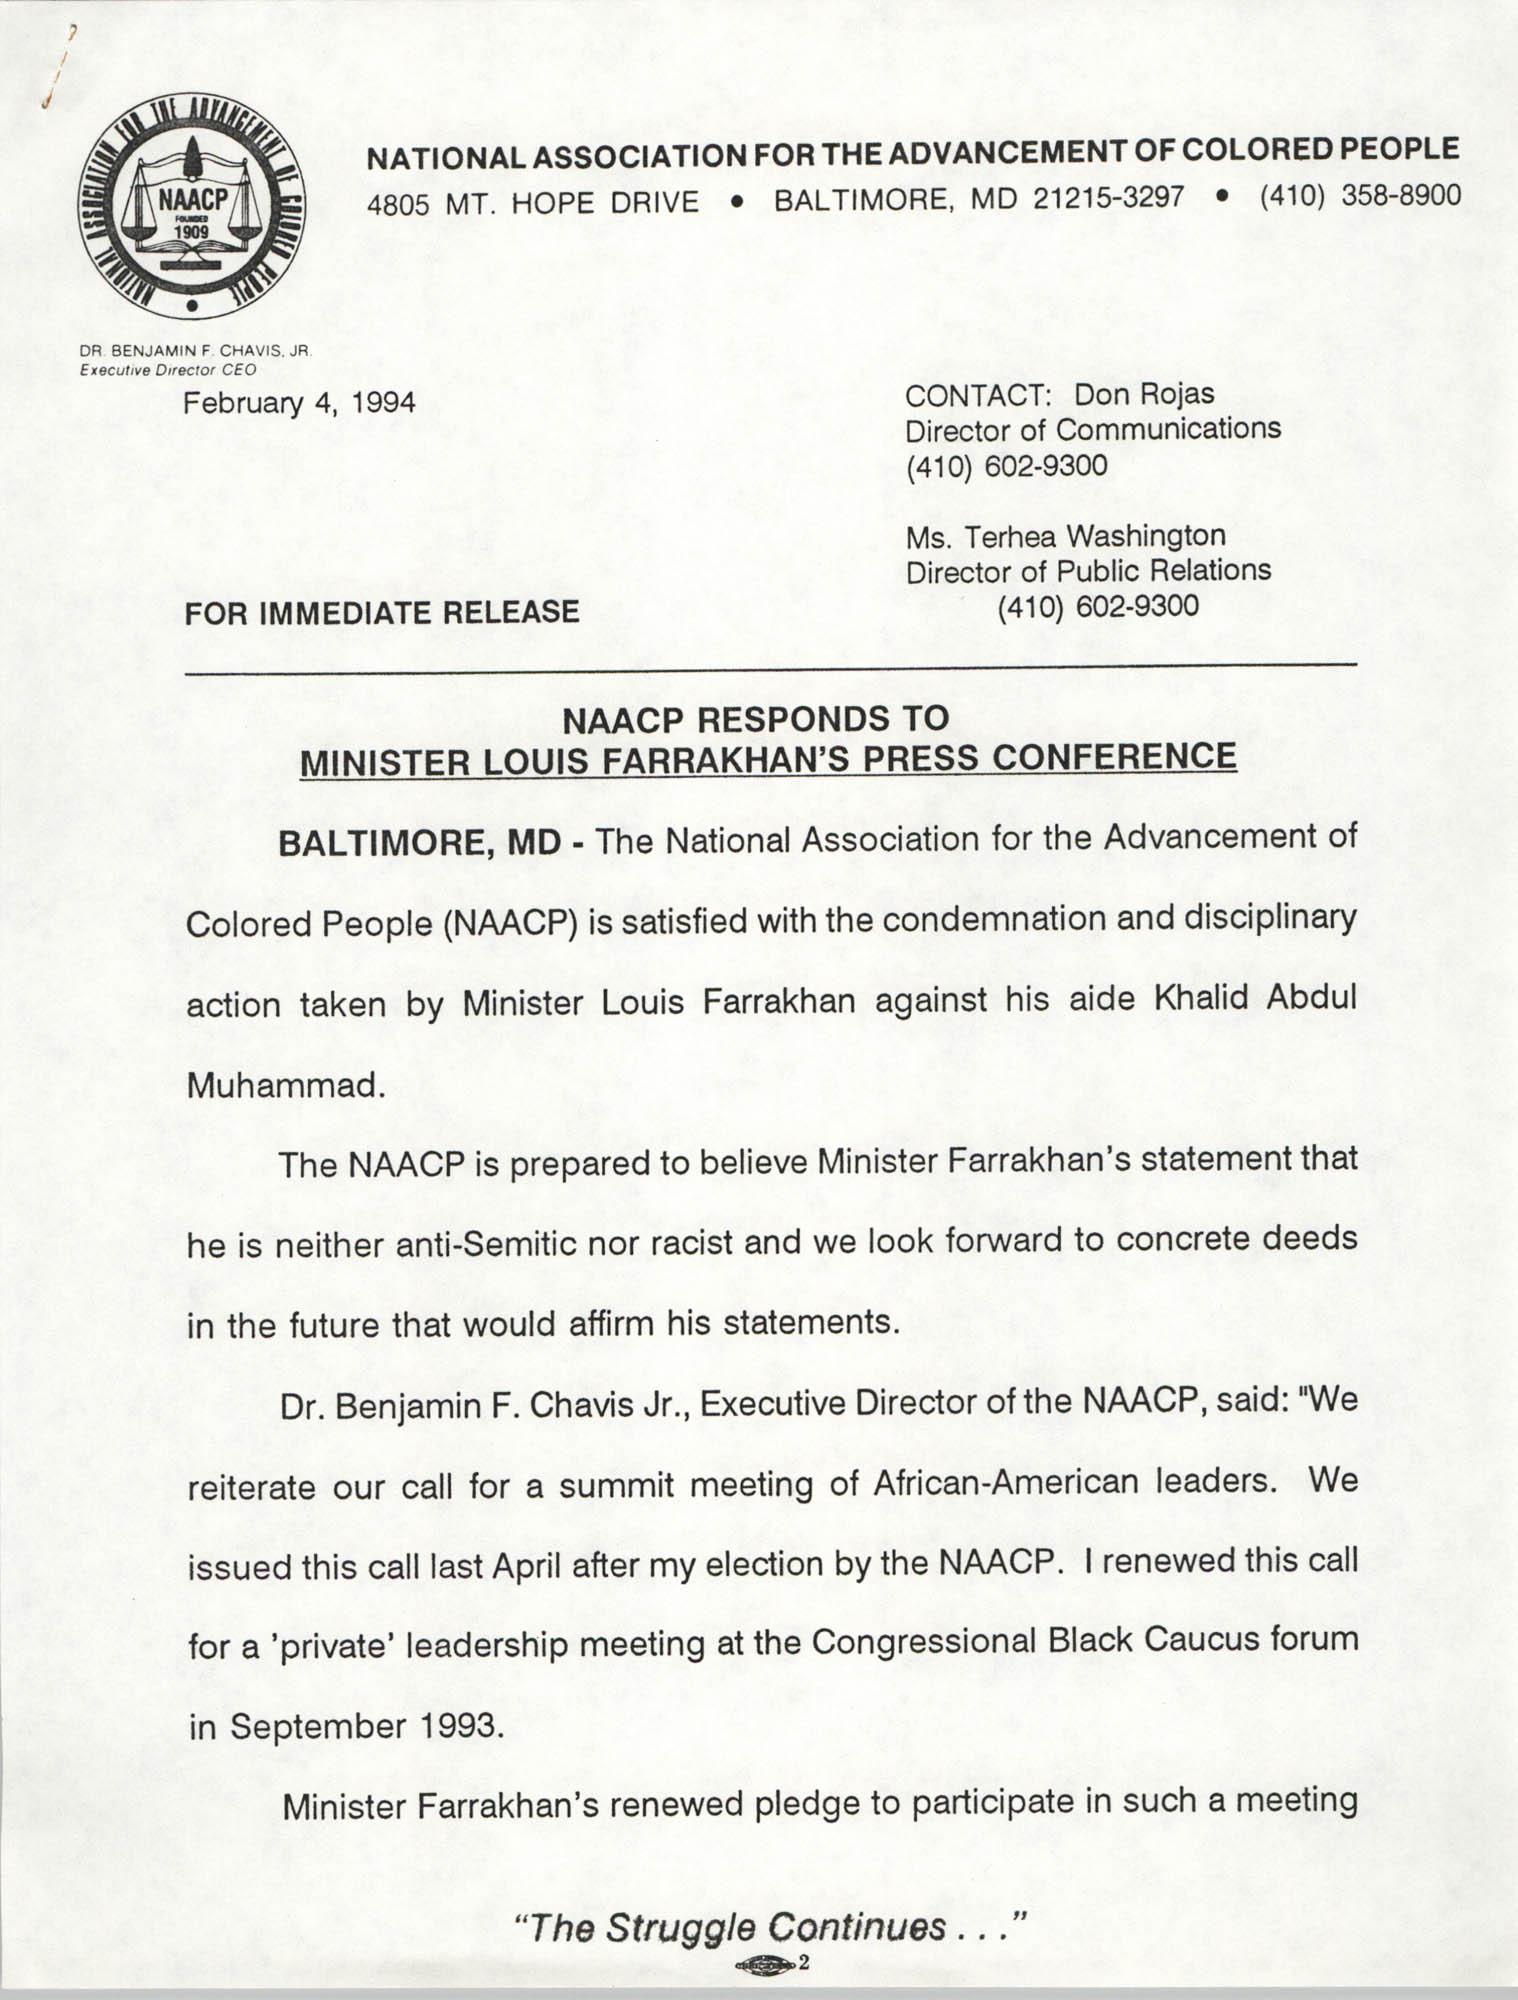 NAACP Press Release, February 4, 1994